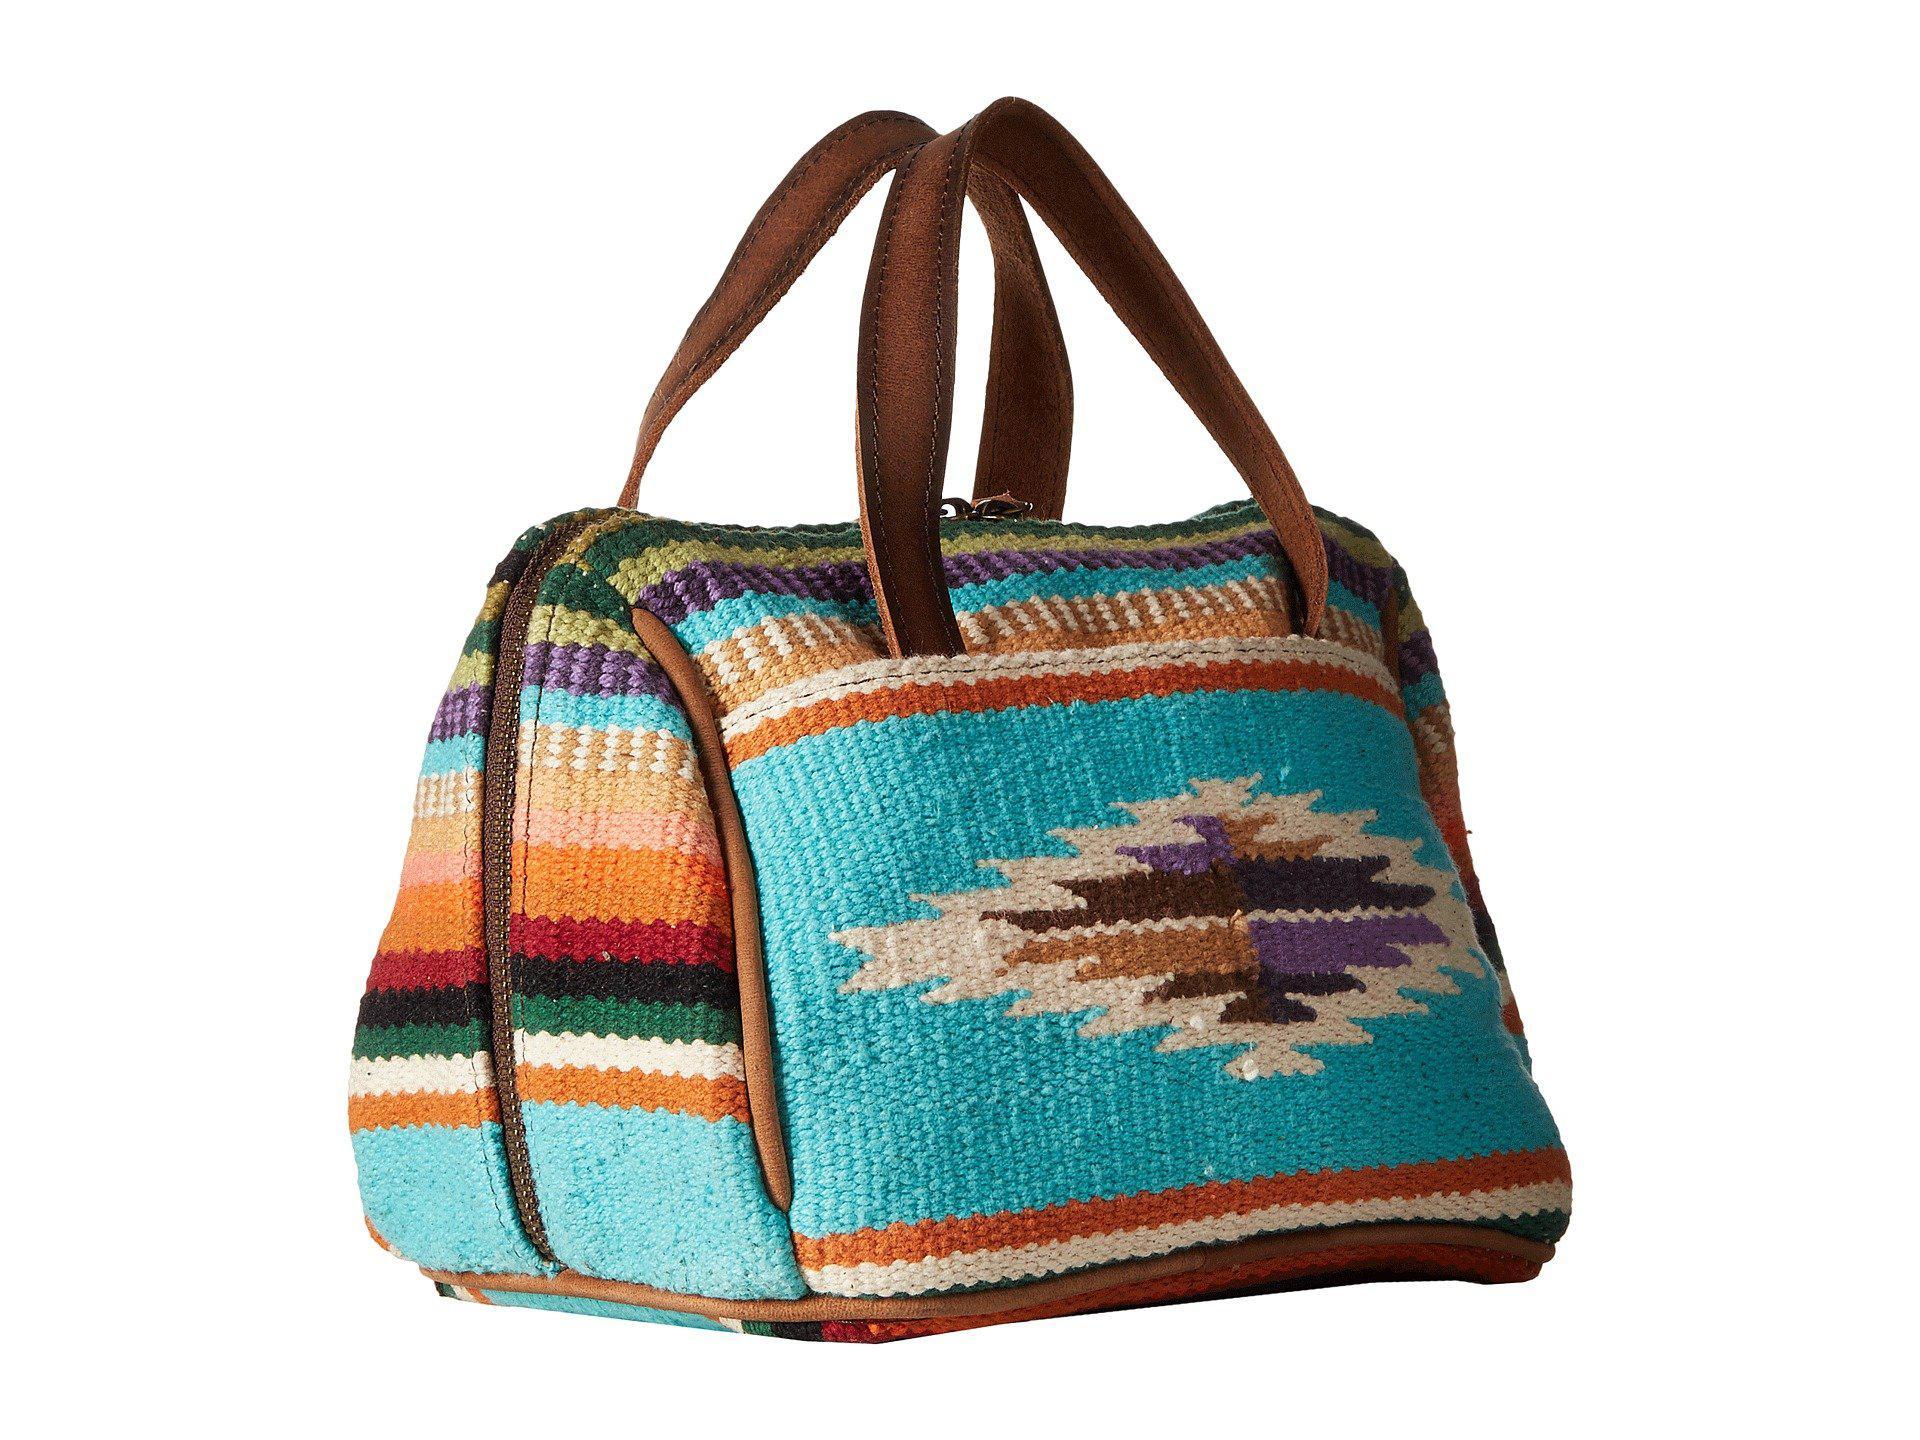 154a3b4b9bb2 Lyst - STS Ranchwear The Makeup Bag (tularosa Serape) Handbags in Blue